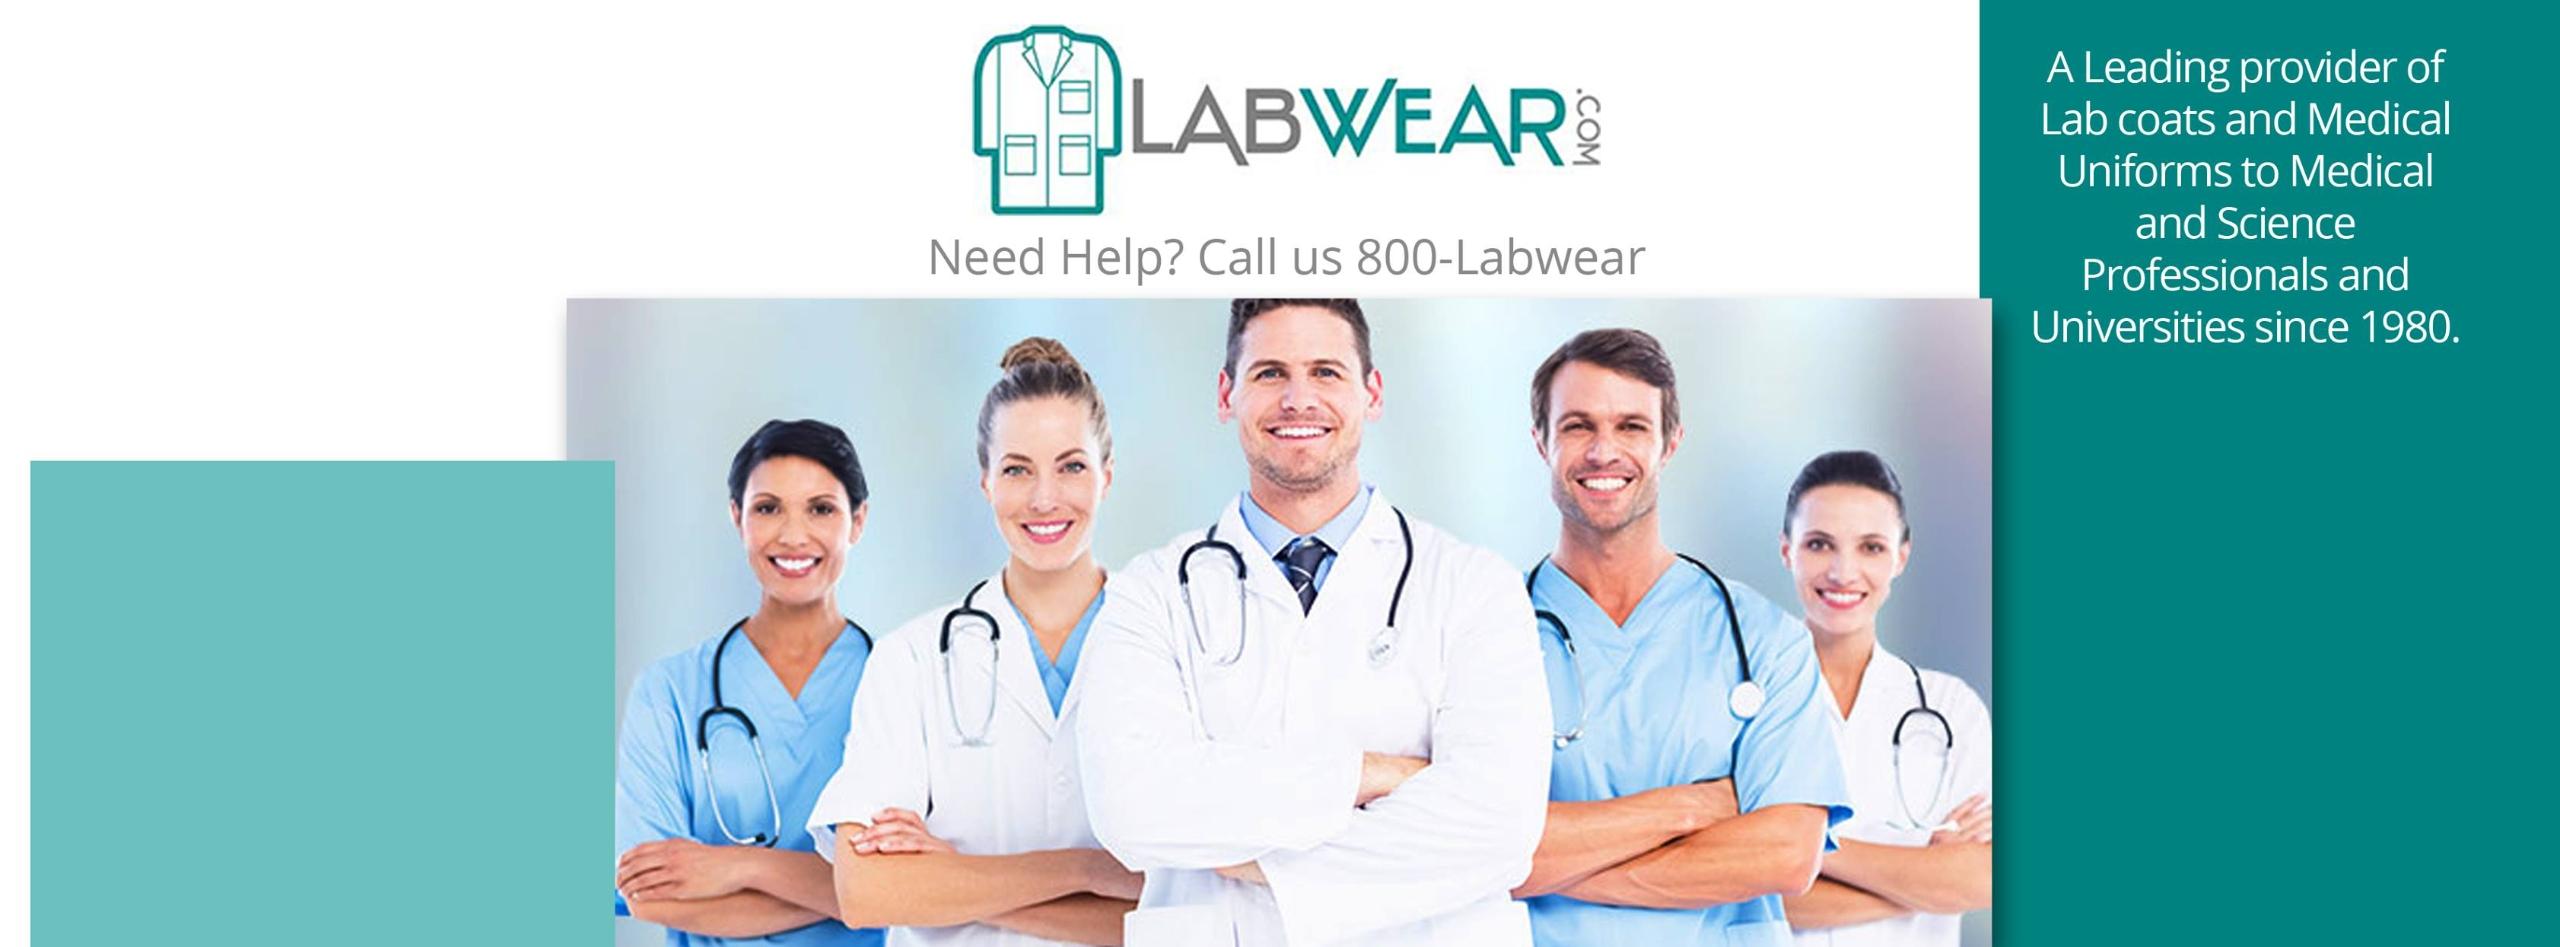 lab wae (@labwear) Cover Image